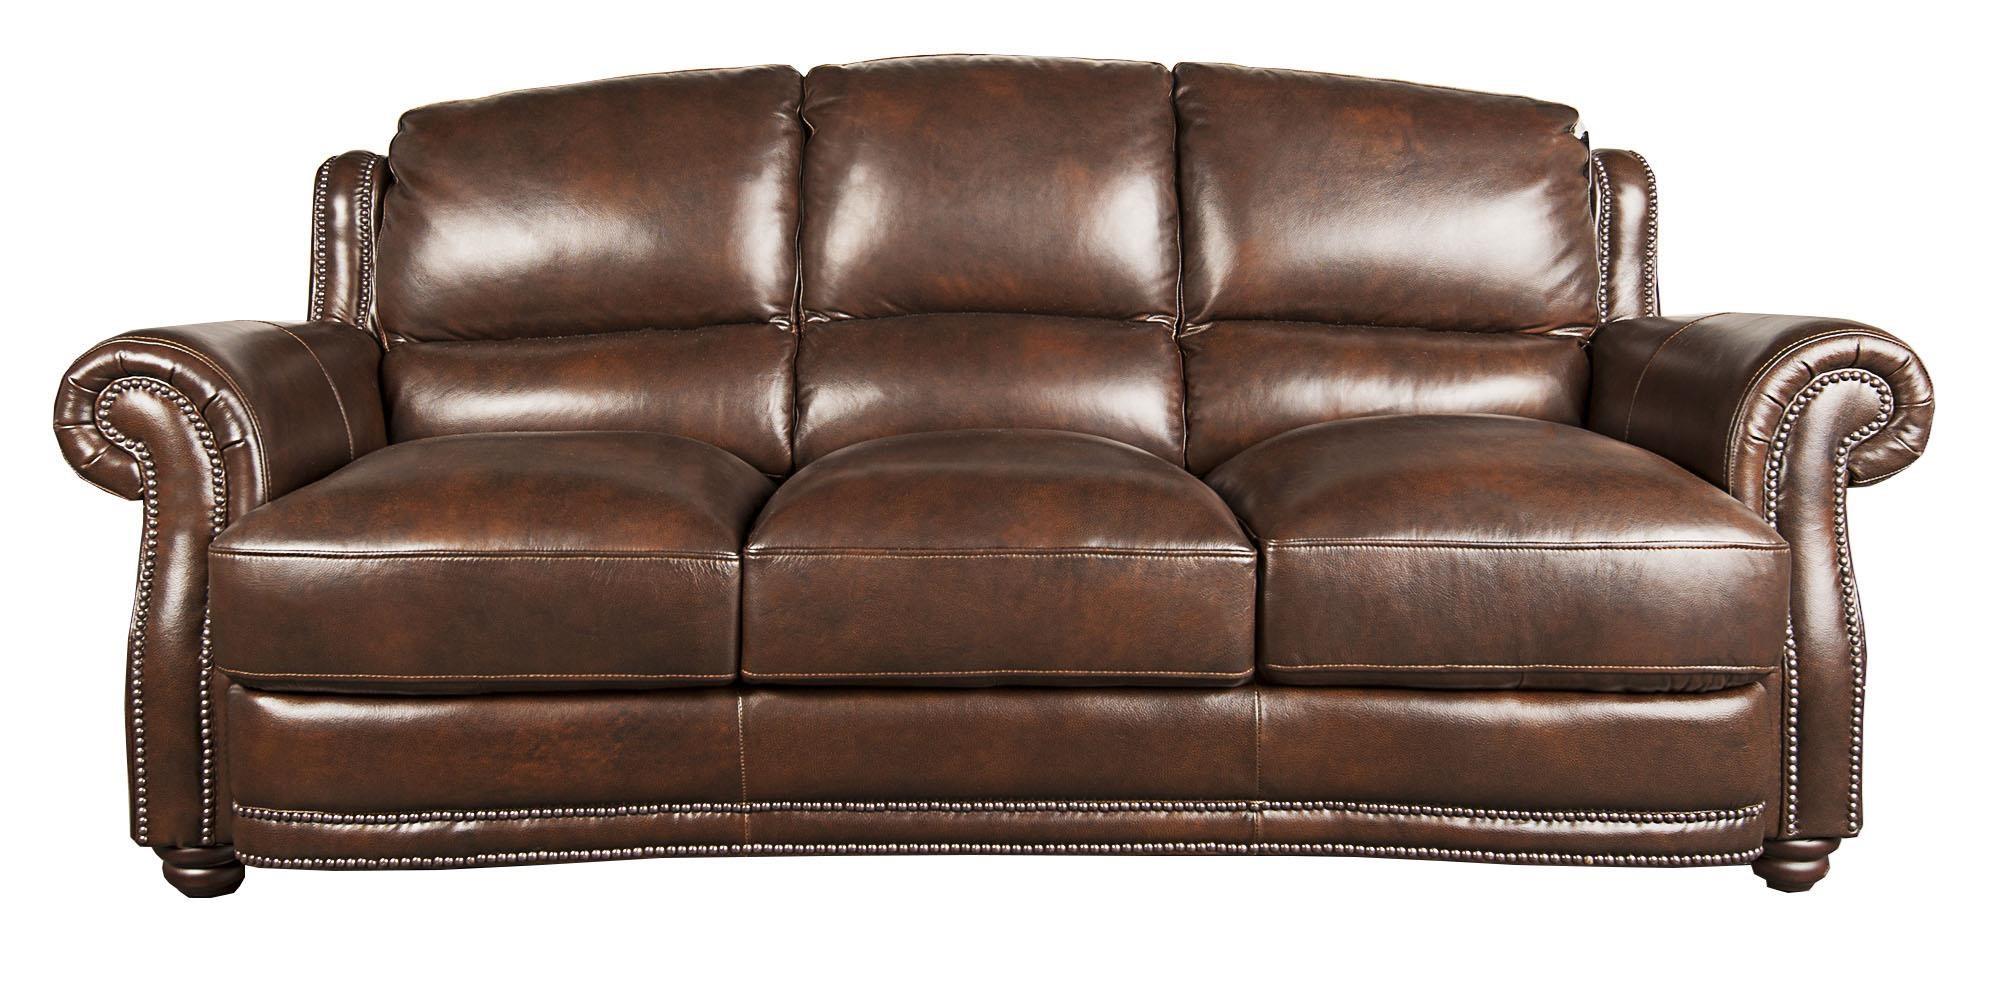 Harrison 100 leather sofa morris home sofas for Morris home